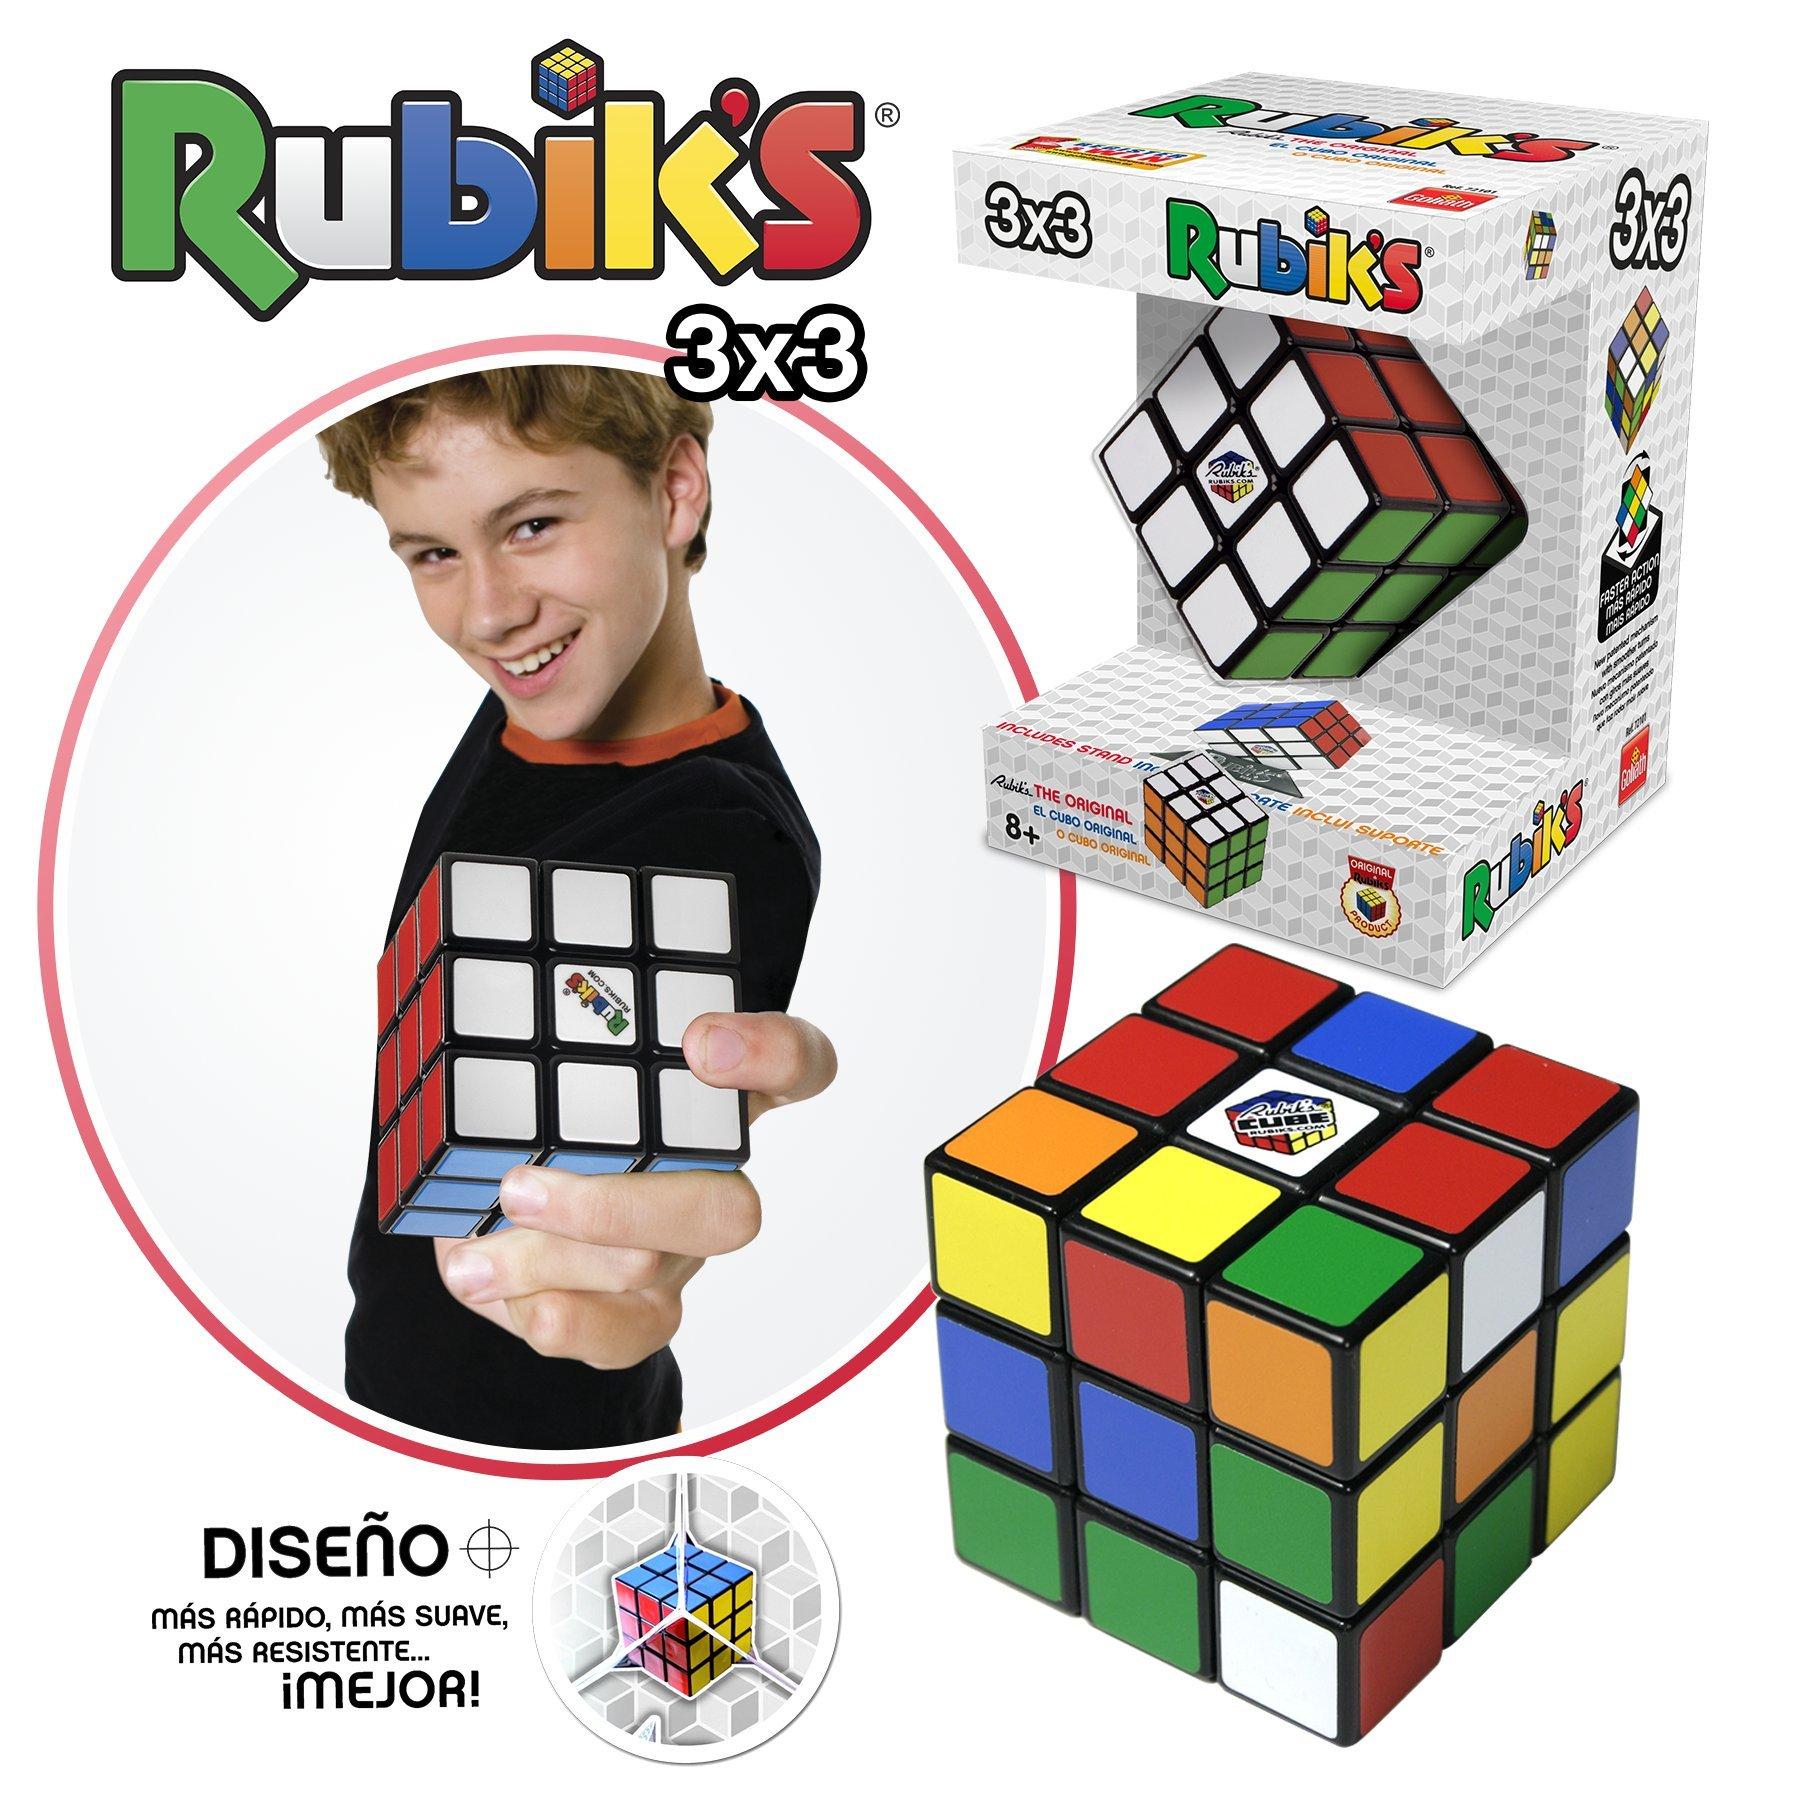 Comprar Goliath-72156 Rubik'S Cubo De Rubik, Multicolor, Talla Única (118-72101)